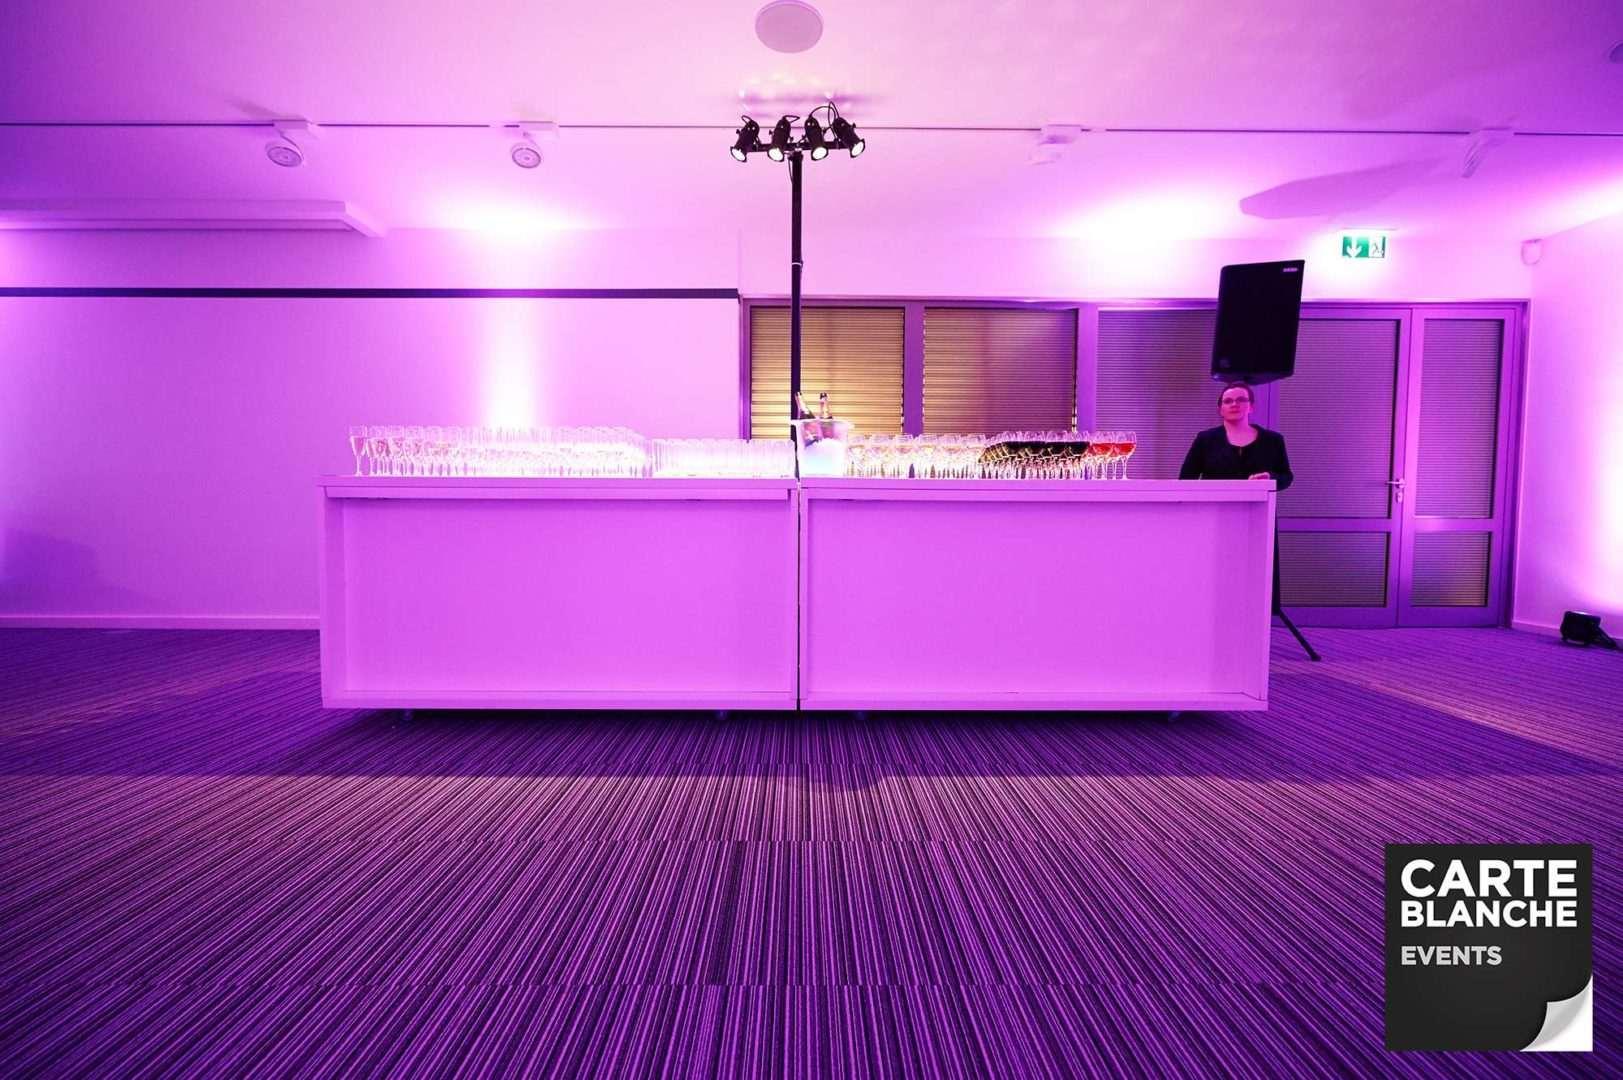 xmas-degroof-petercam-2015-044-luxembourg-event